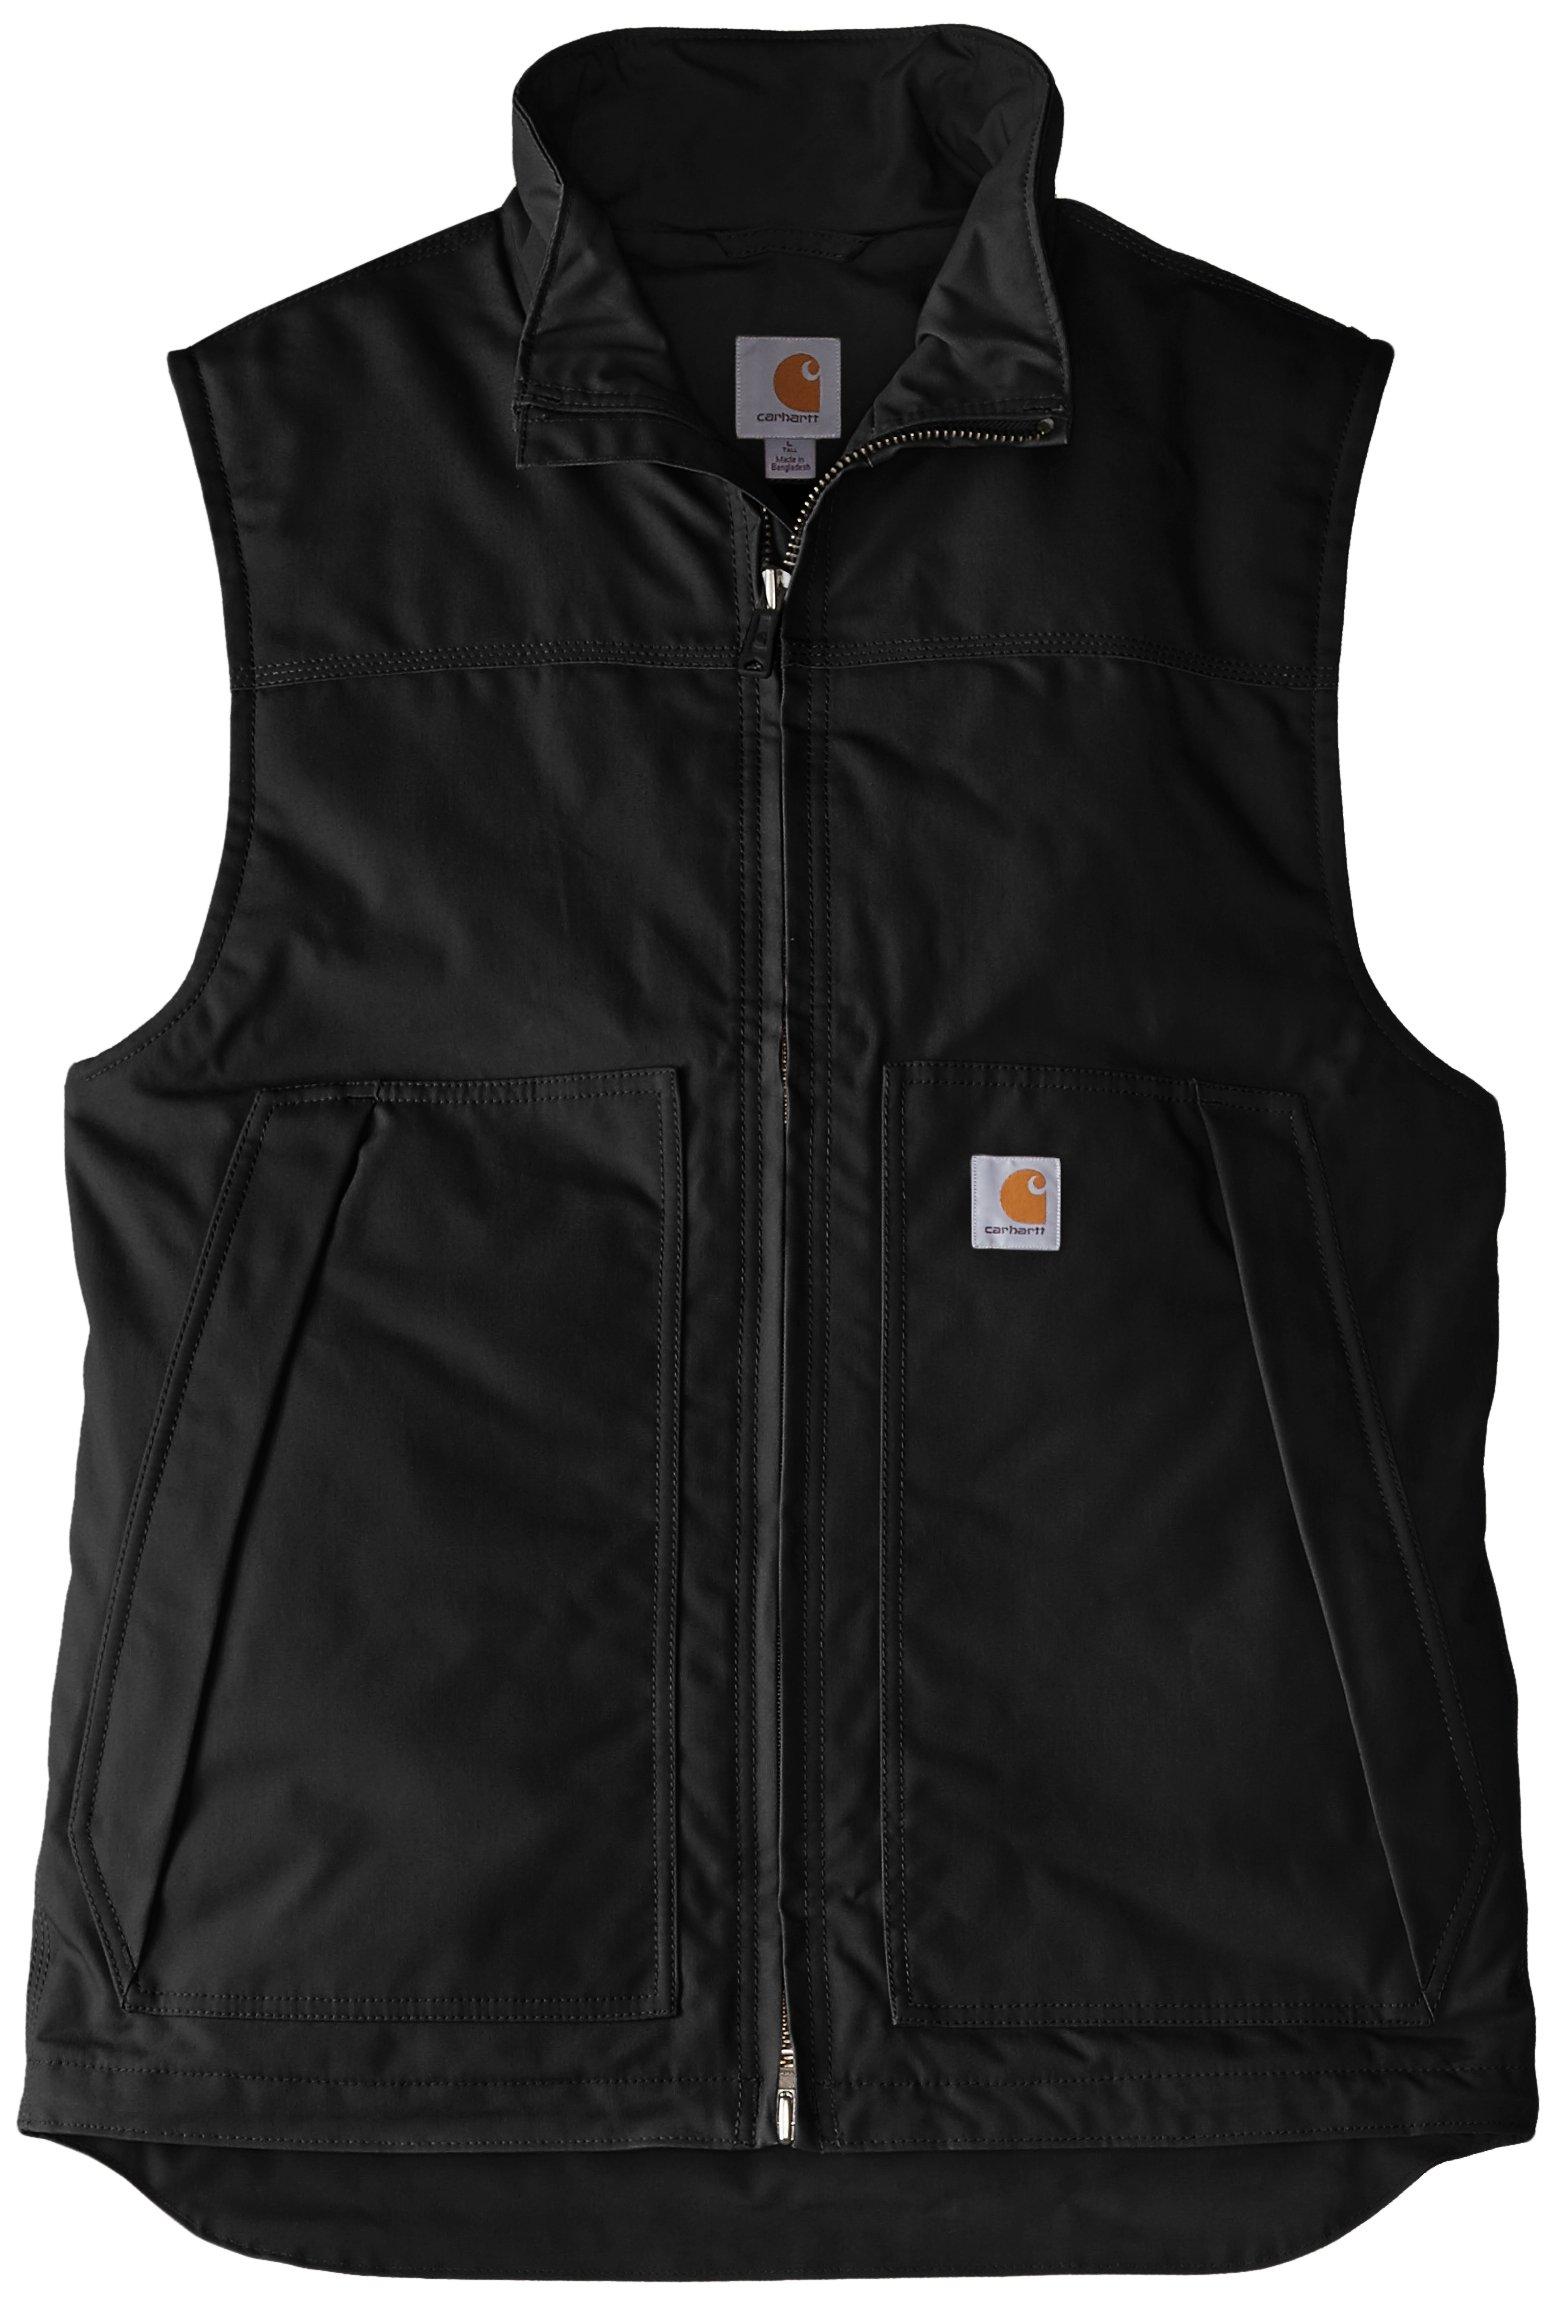 Carhartt Men's Big & Tall Quick Duck Jefferson Vest